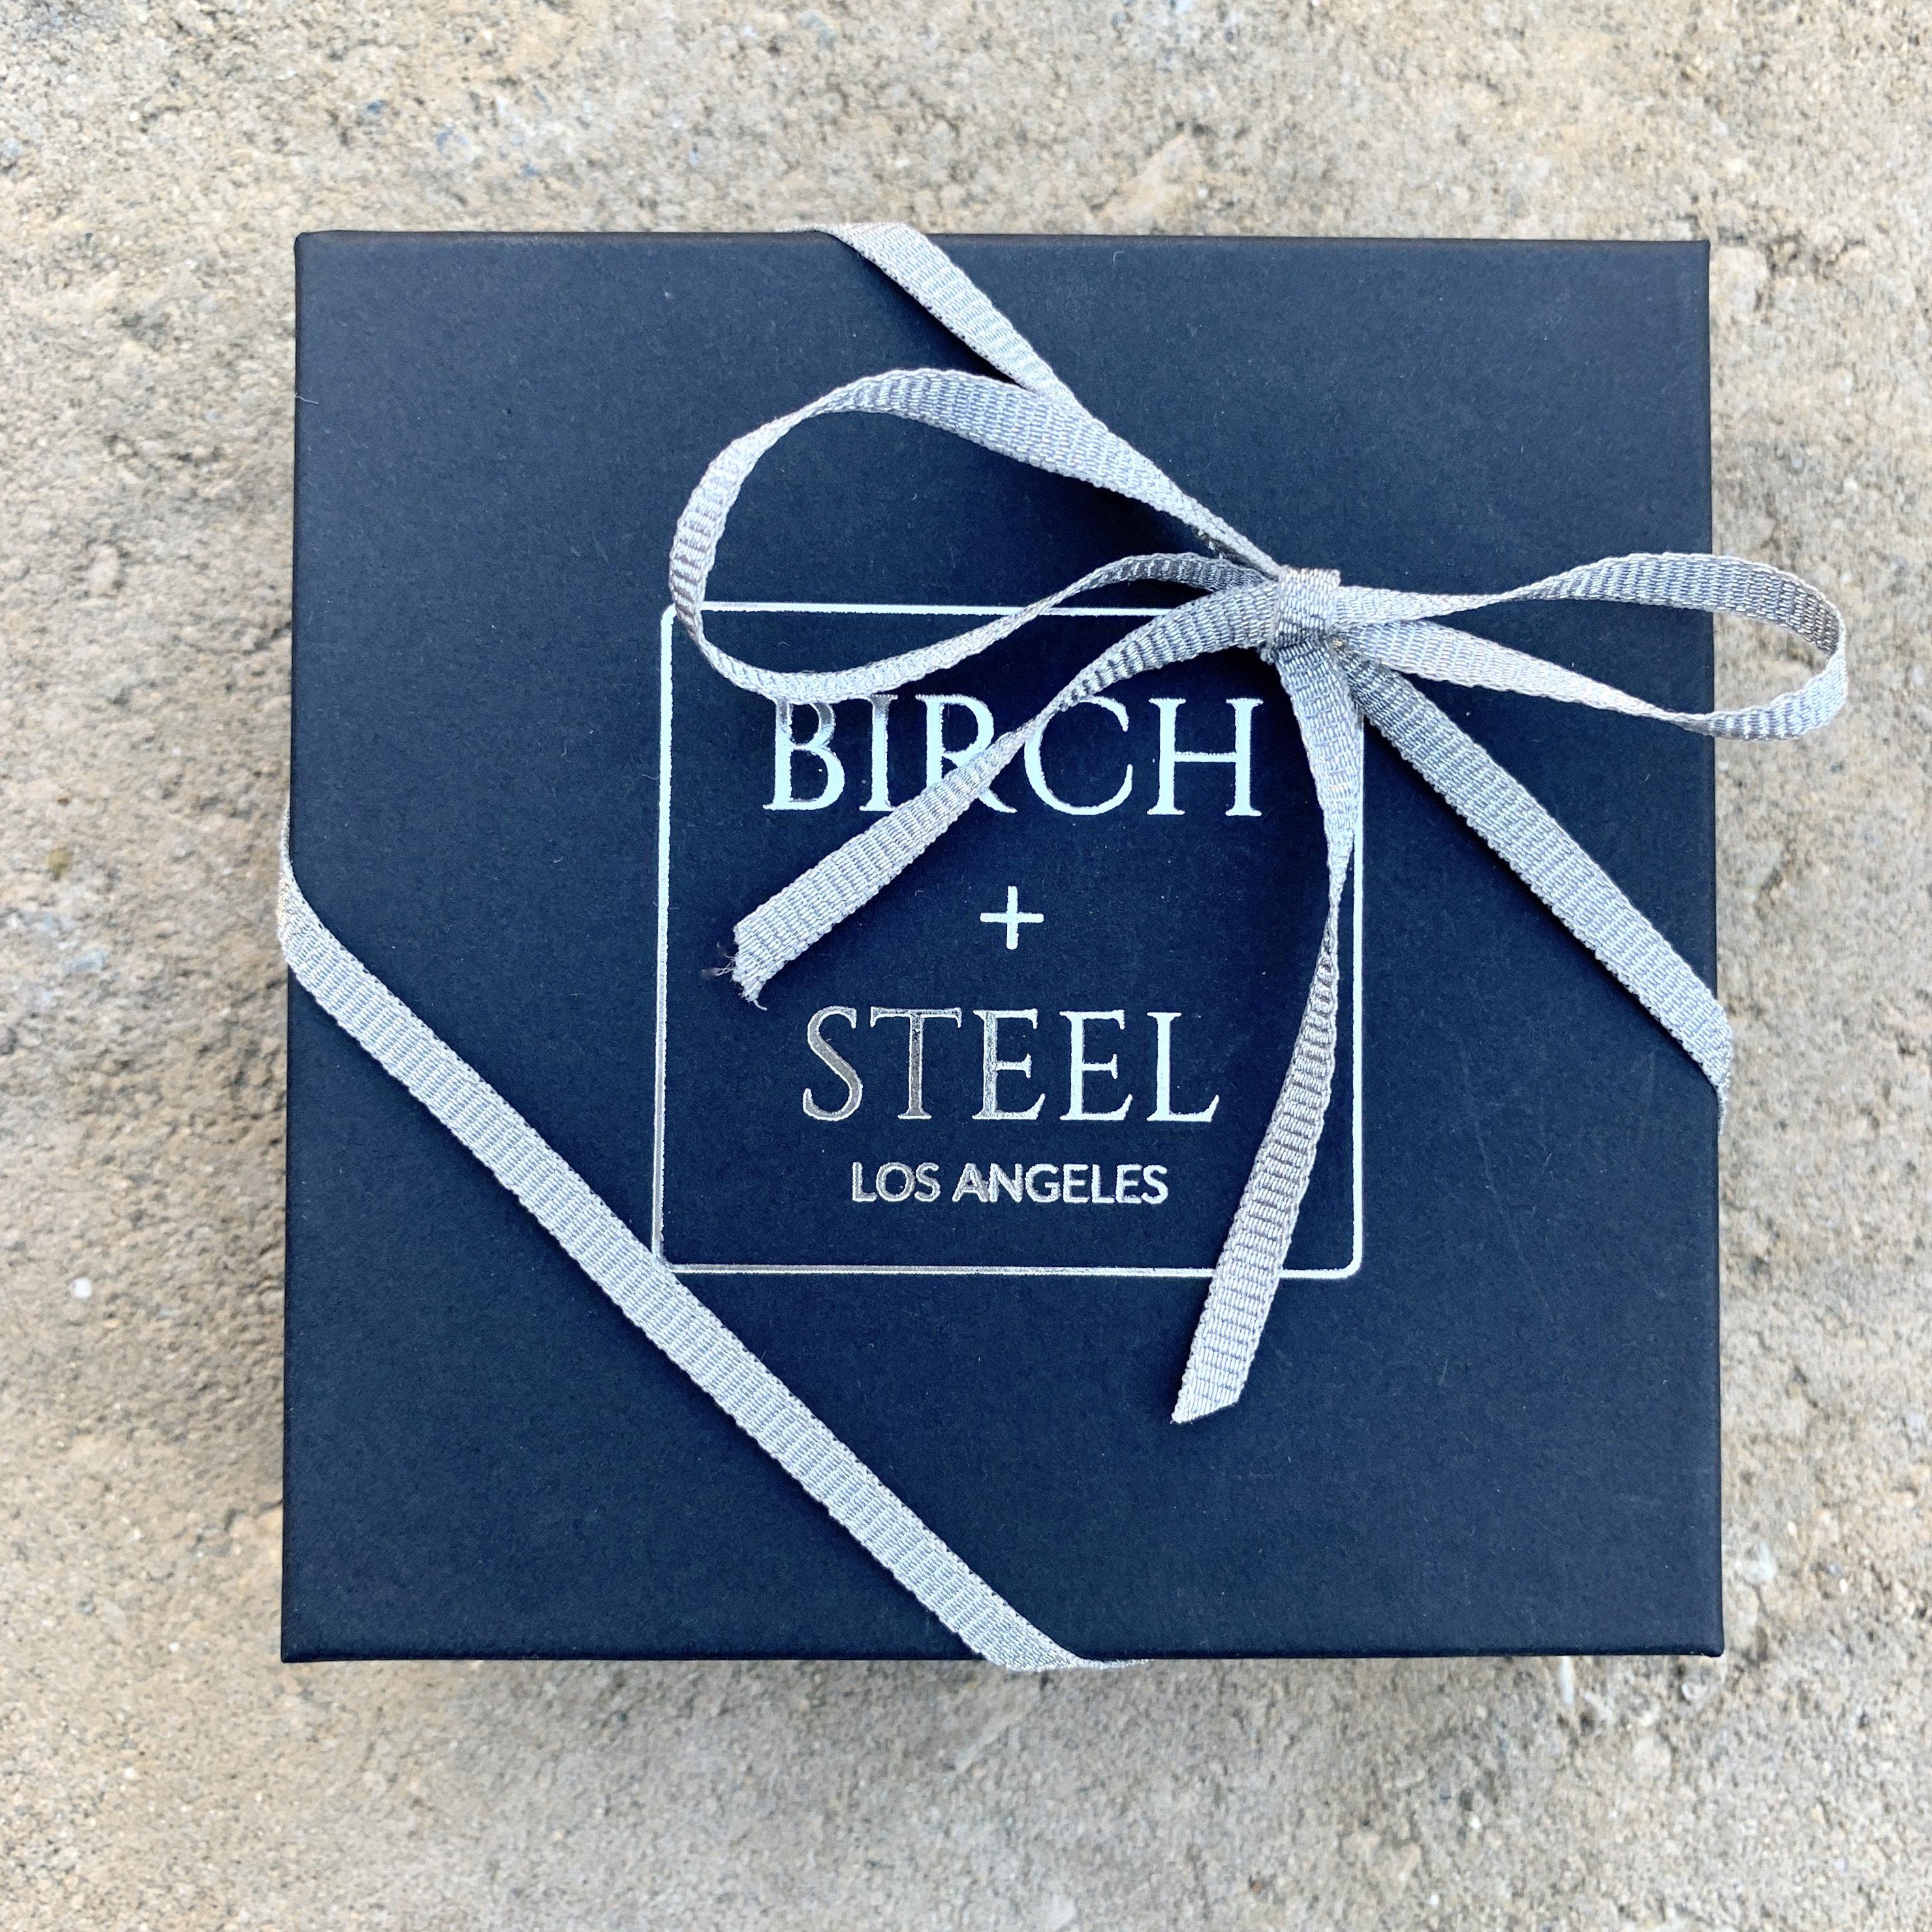 Add-On for Birch+Steel Leather Bracelet Resize Request